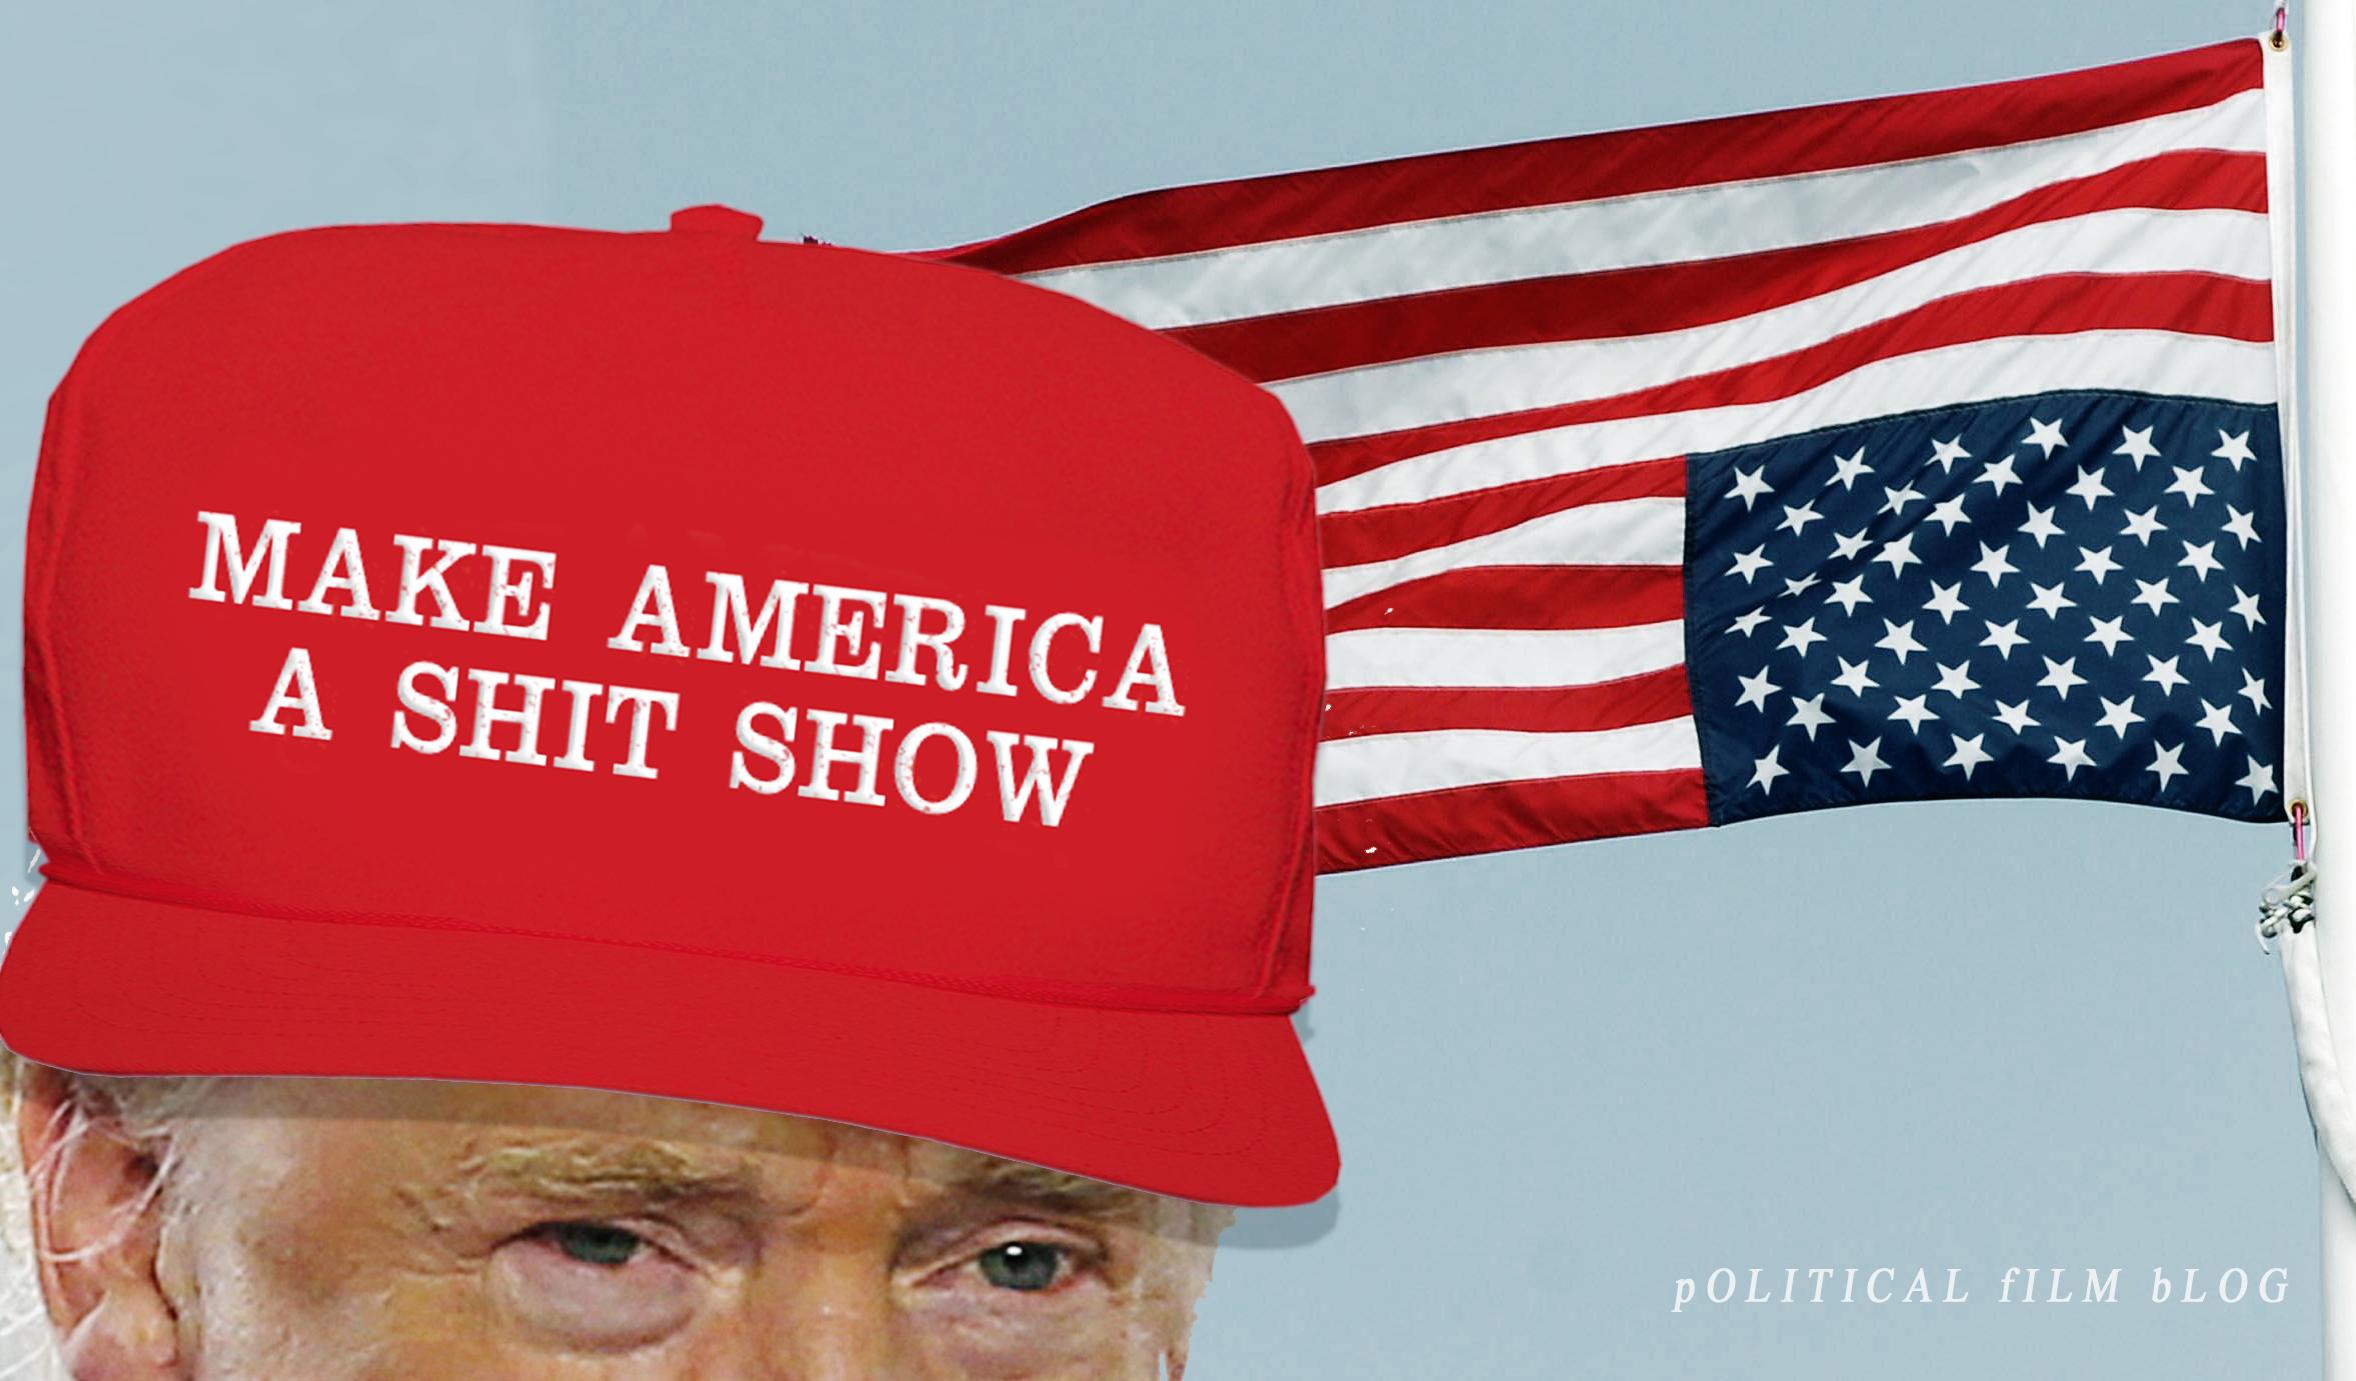 MAKE-AMERICA-A-SHIT-SHOW copy